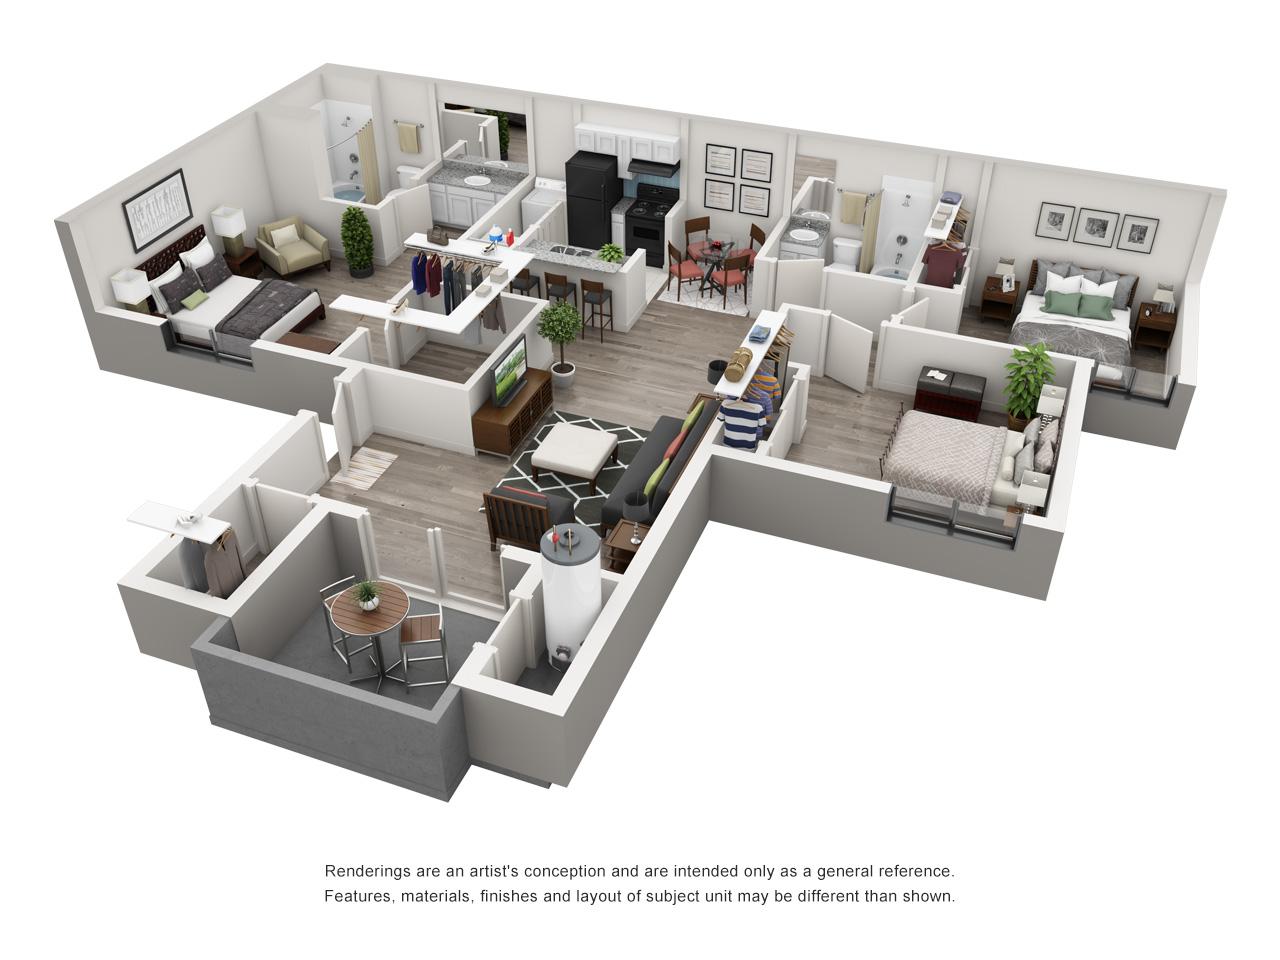 Spacious 3 Bedroom Apartment at Palm Canyon Apartment Homes at Palm Canyon, Tucson